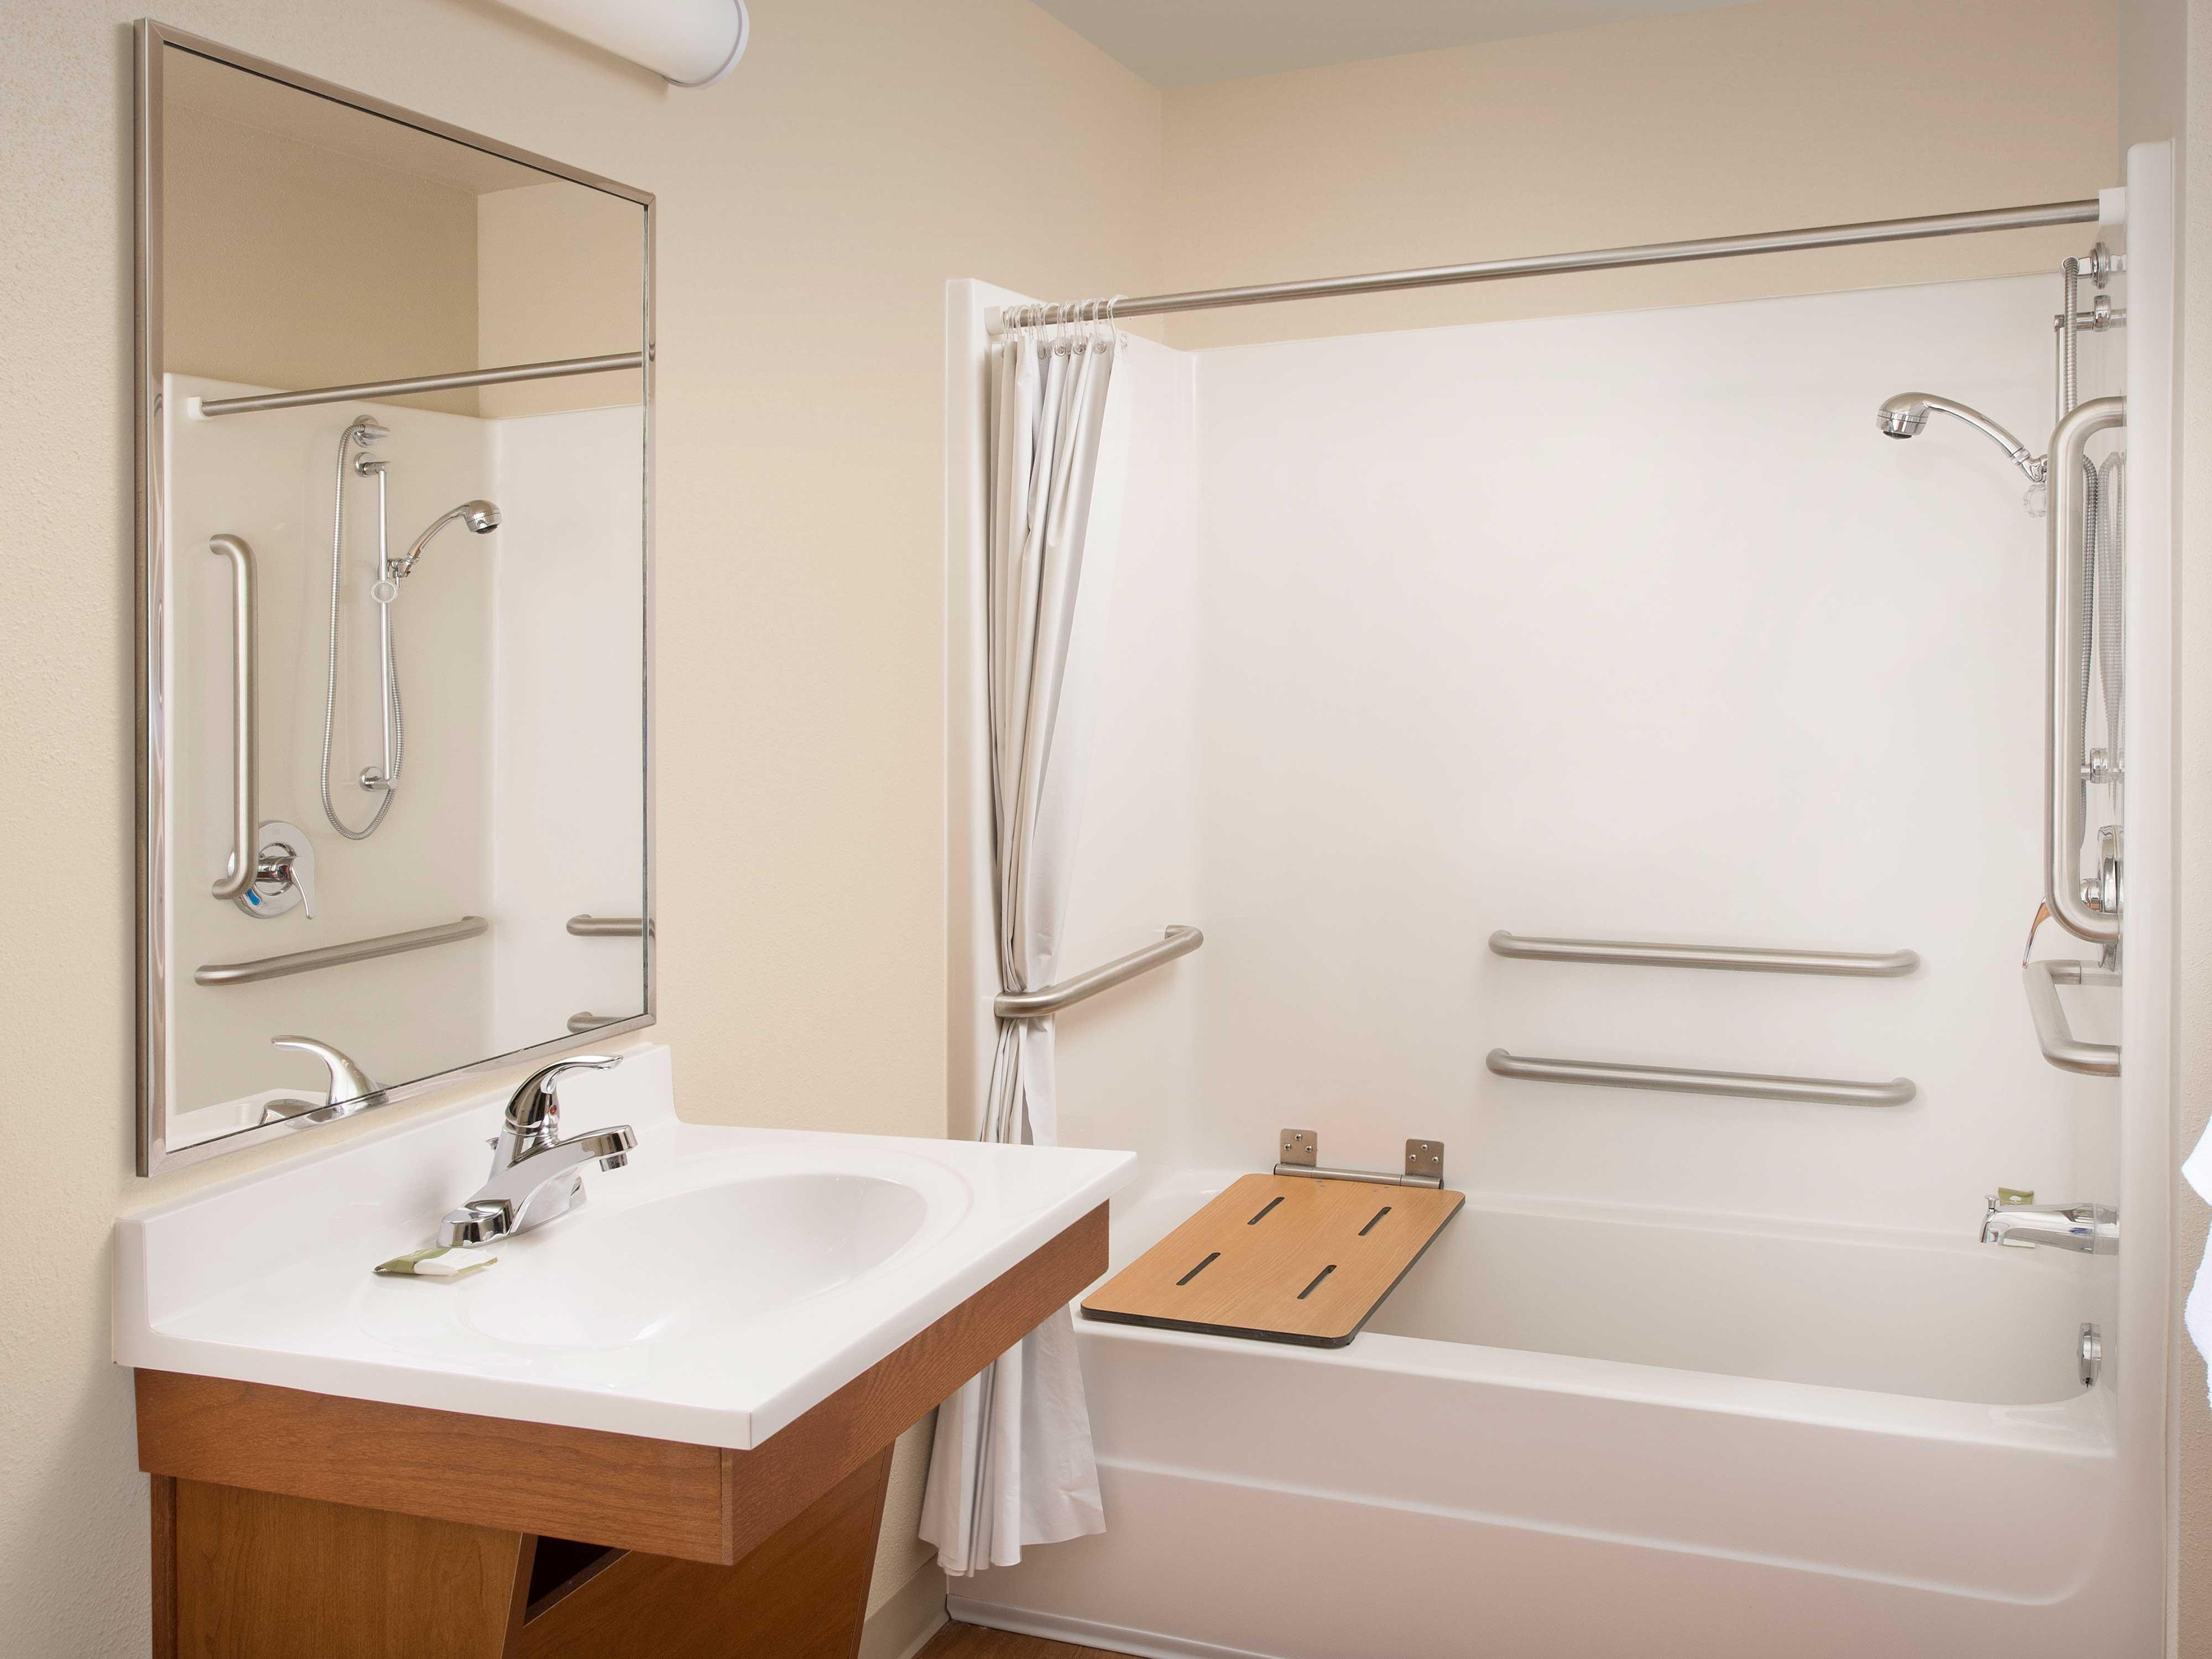 WoodSpring Suites Grand Rapids South image 24